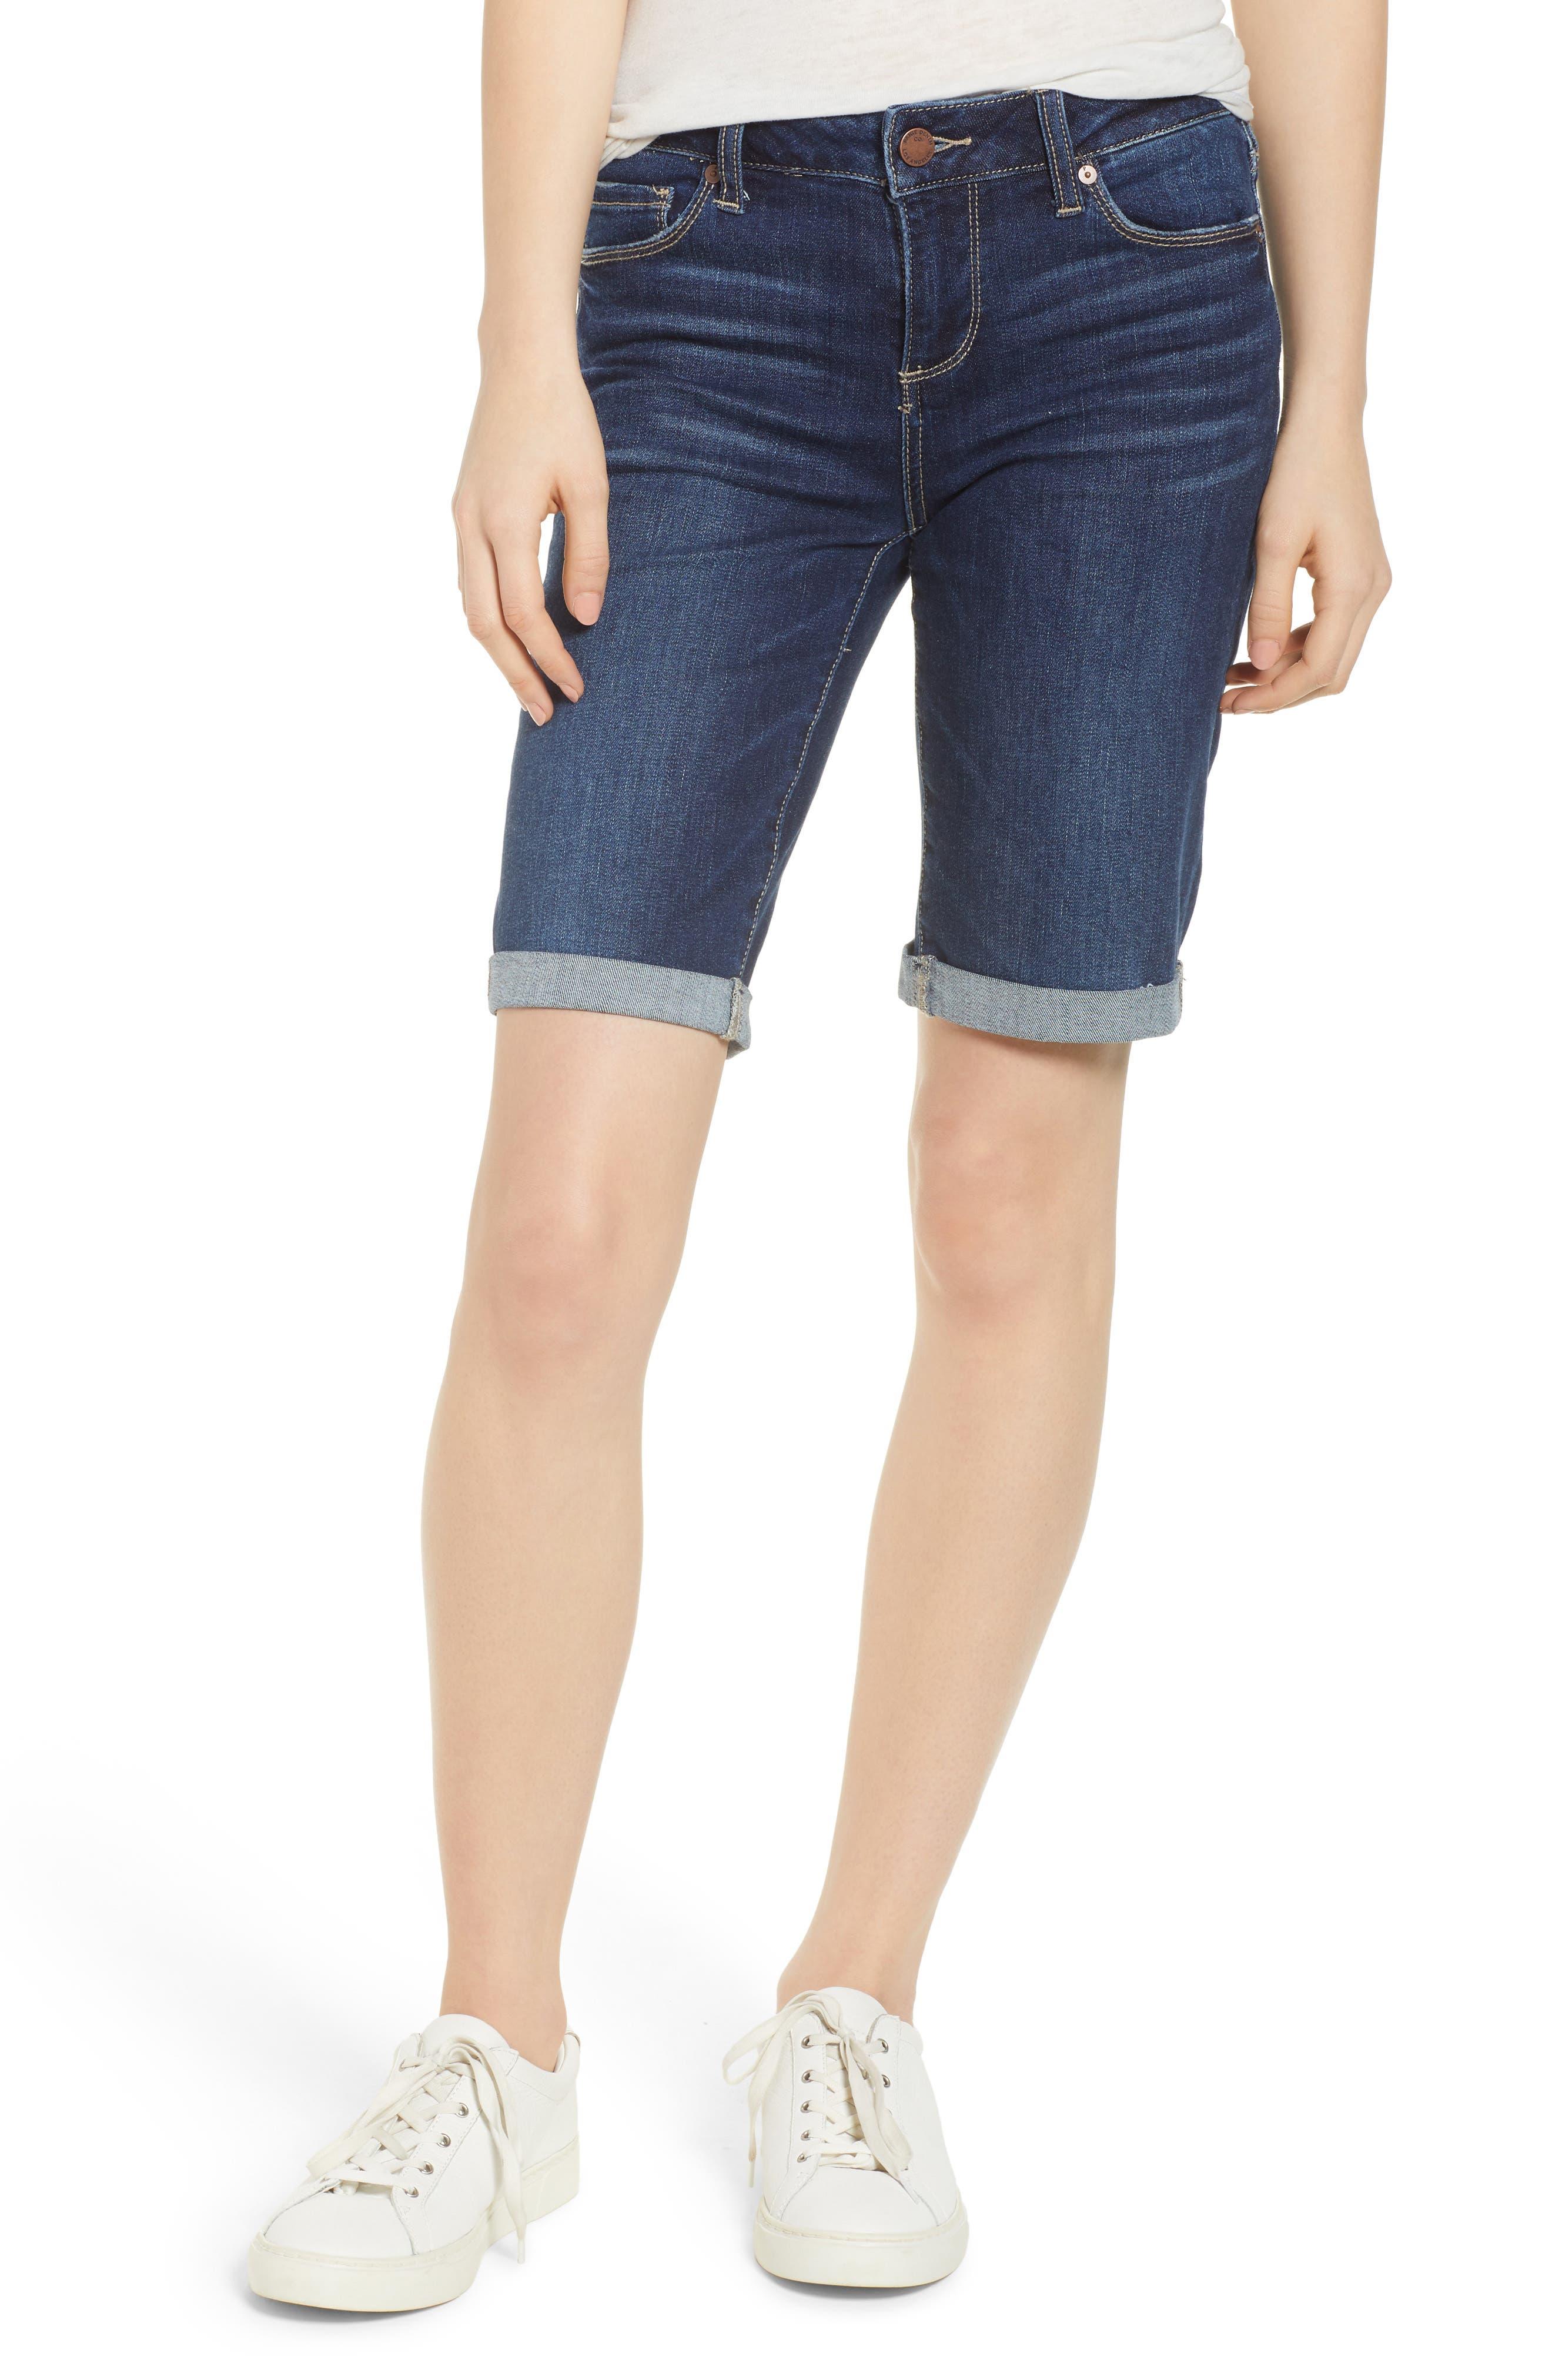 Transcend Vintage - Jax Denim Bermuda Shorts,                             Main thumbnail 1, color,                             400